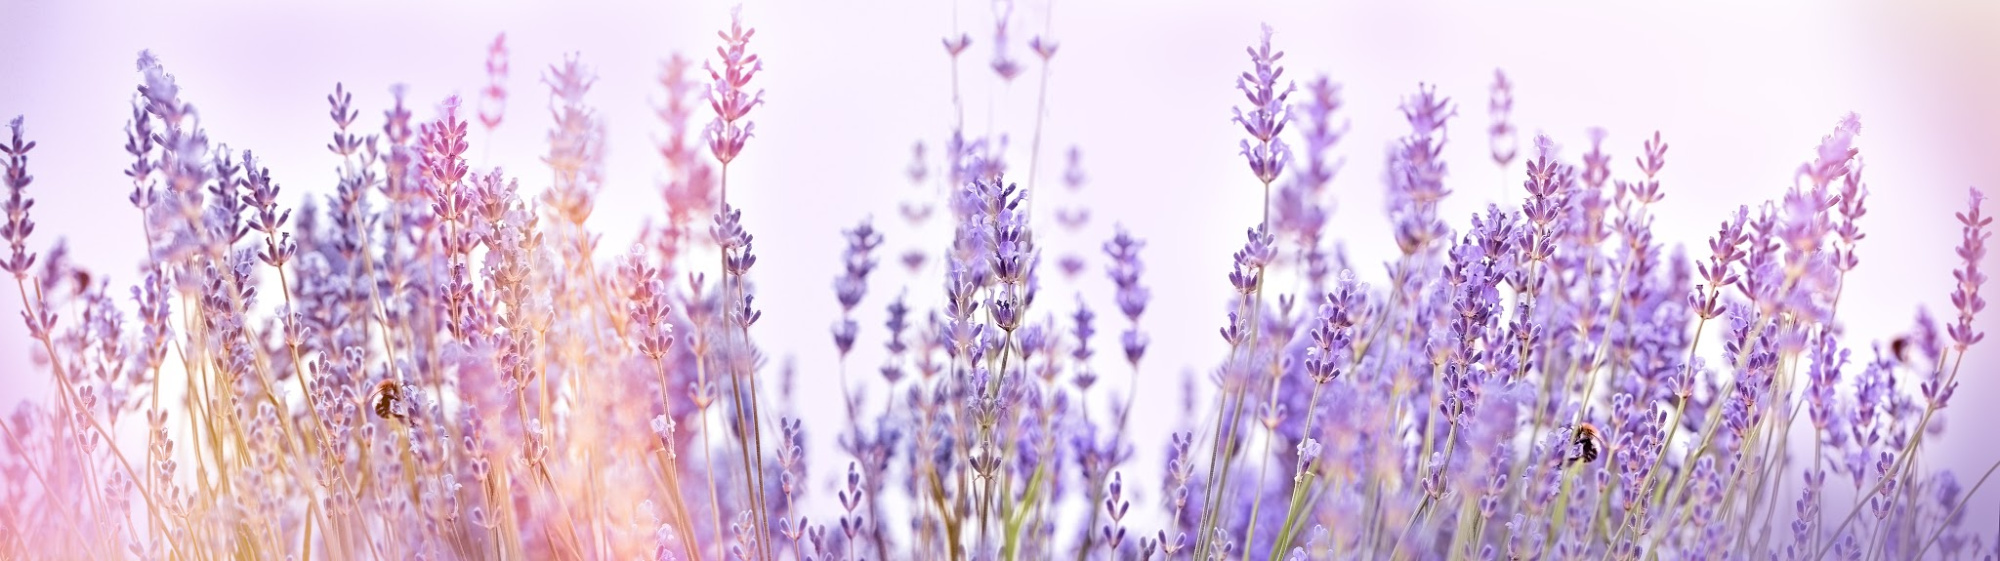 Lavender Field (1).jpg